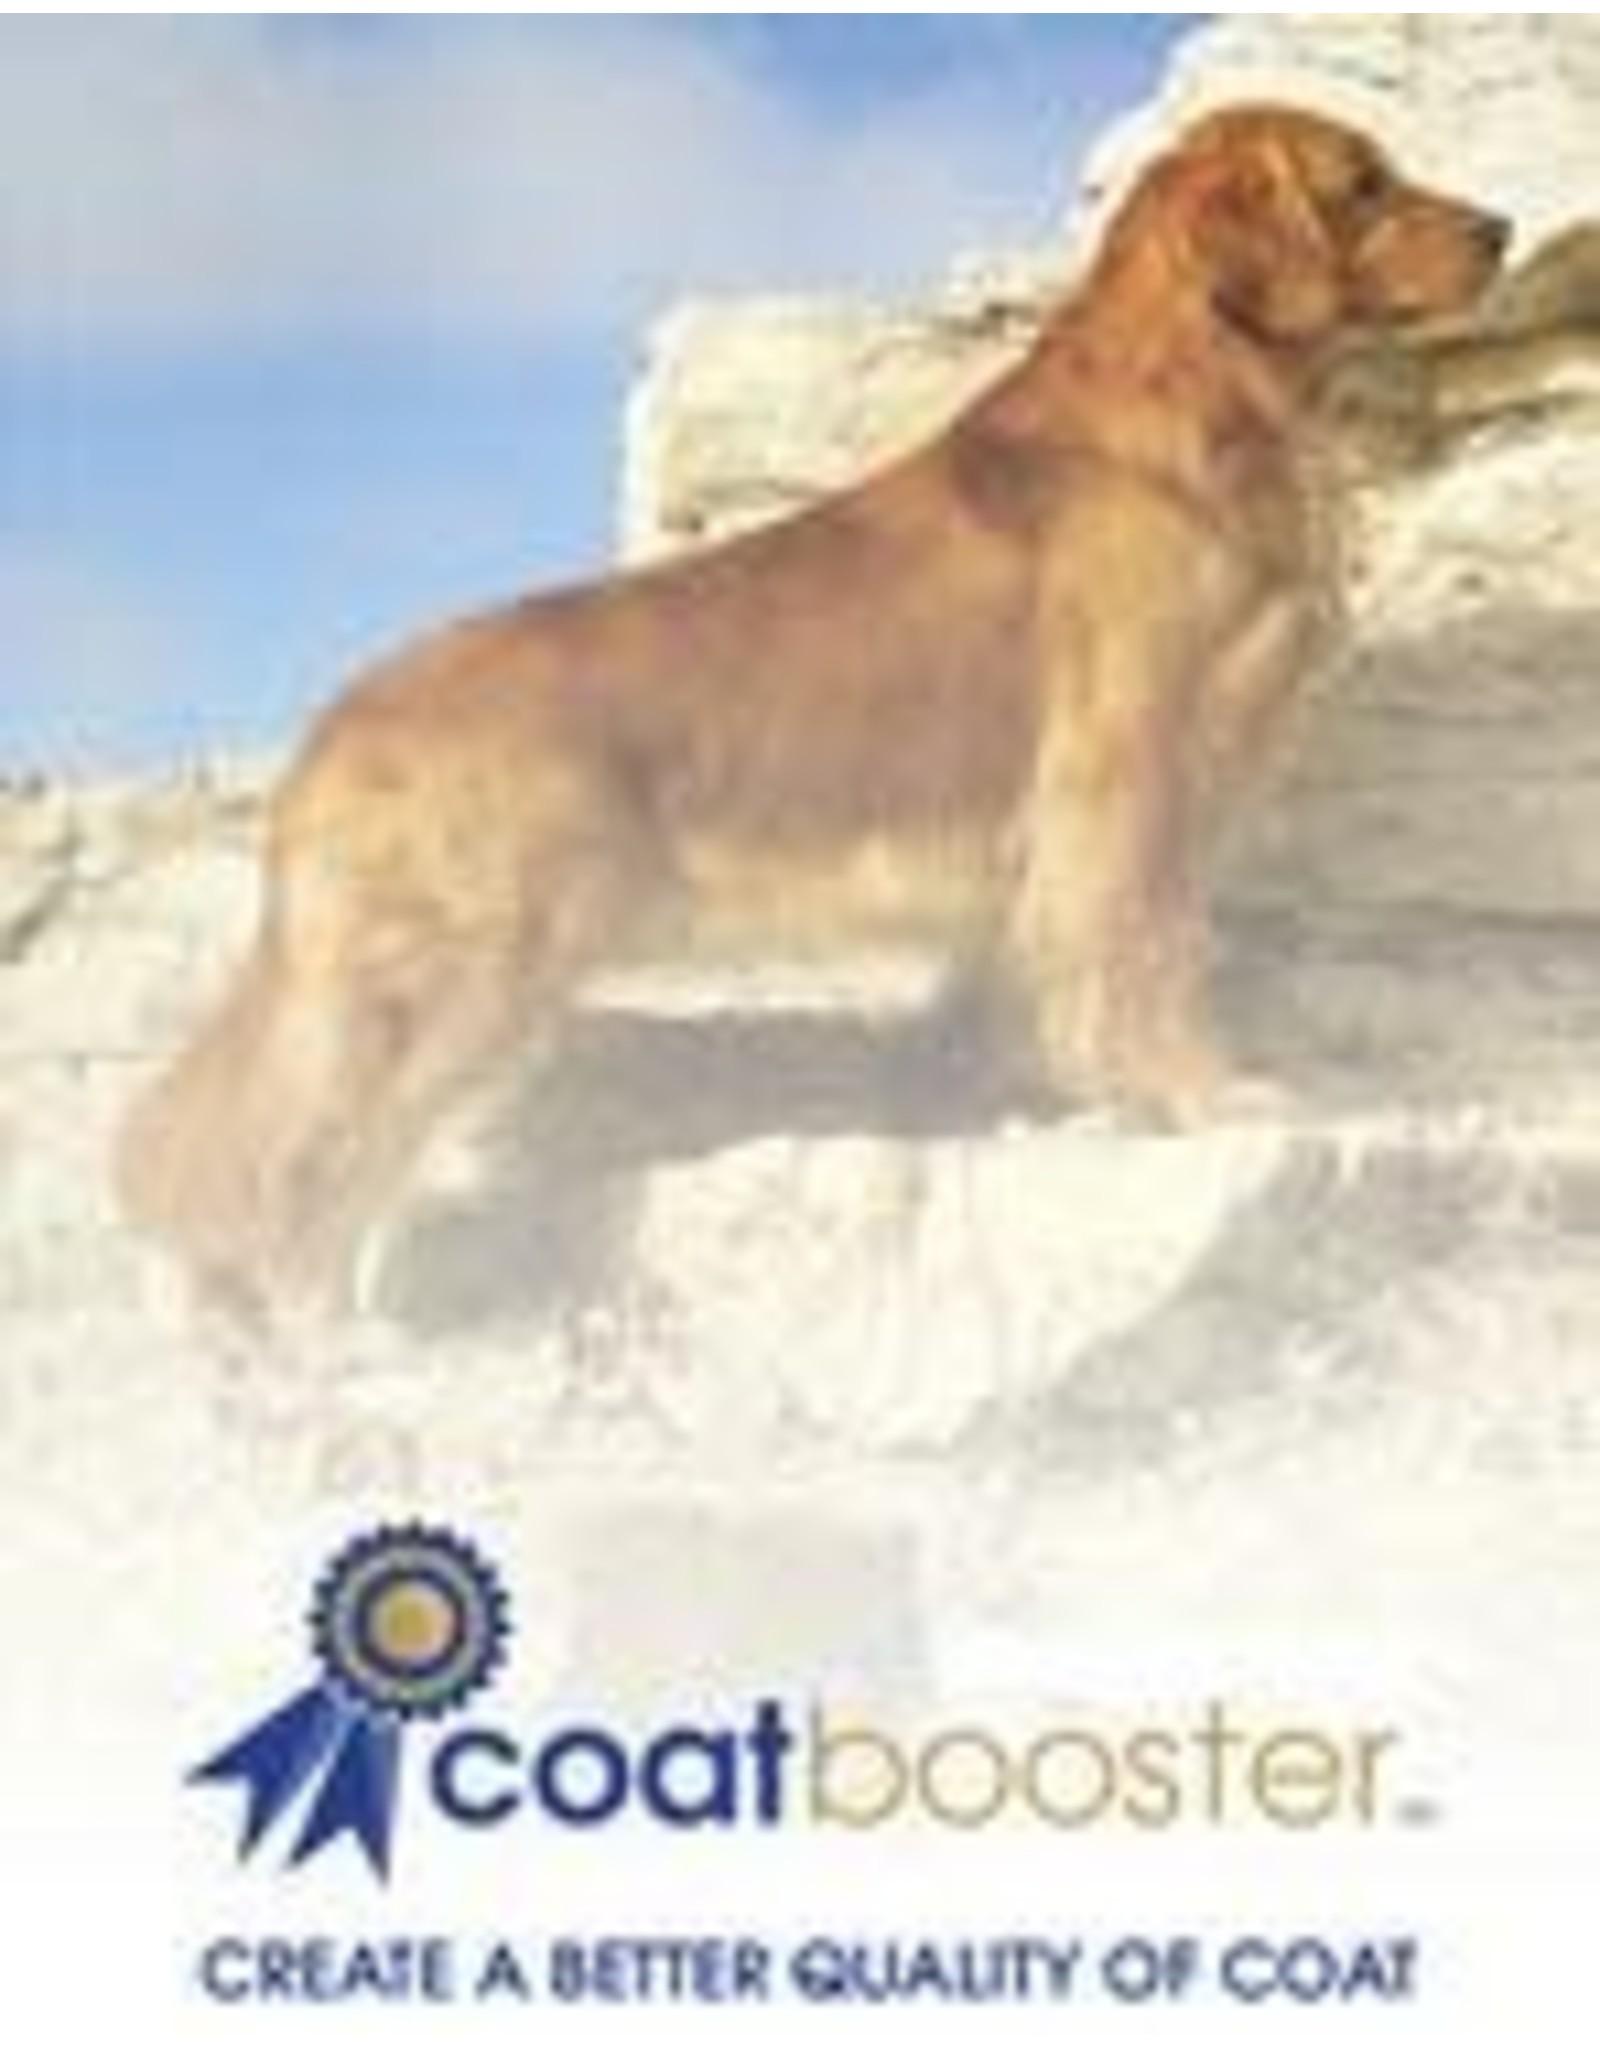 Coat Booster